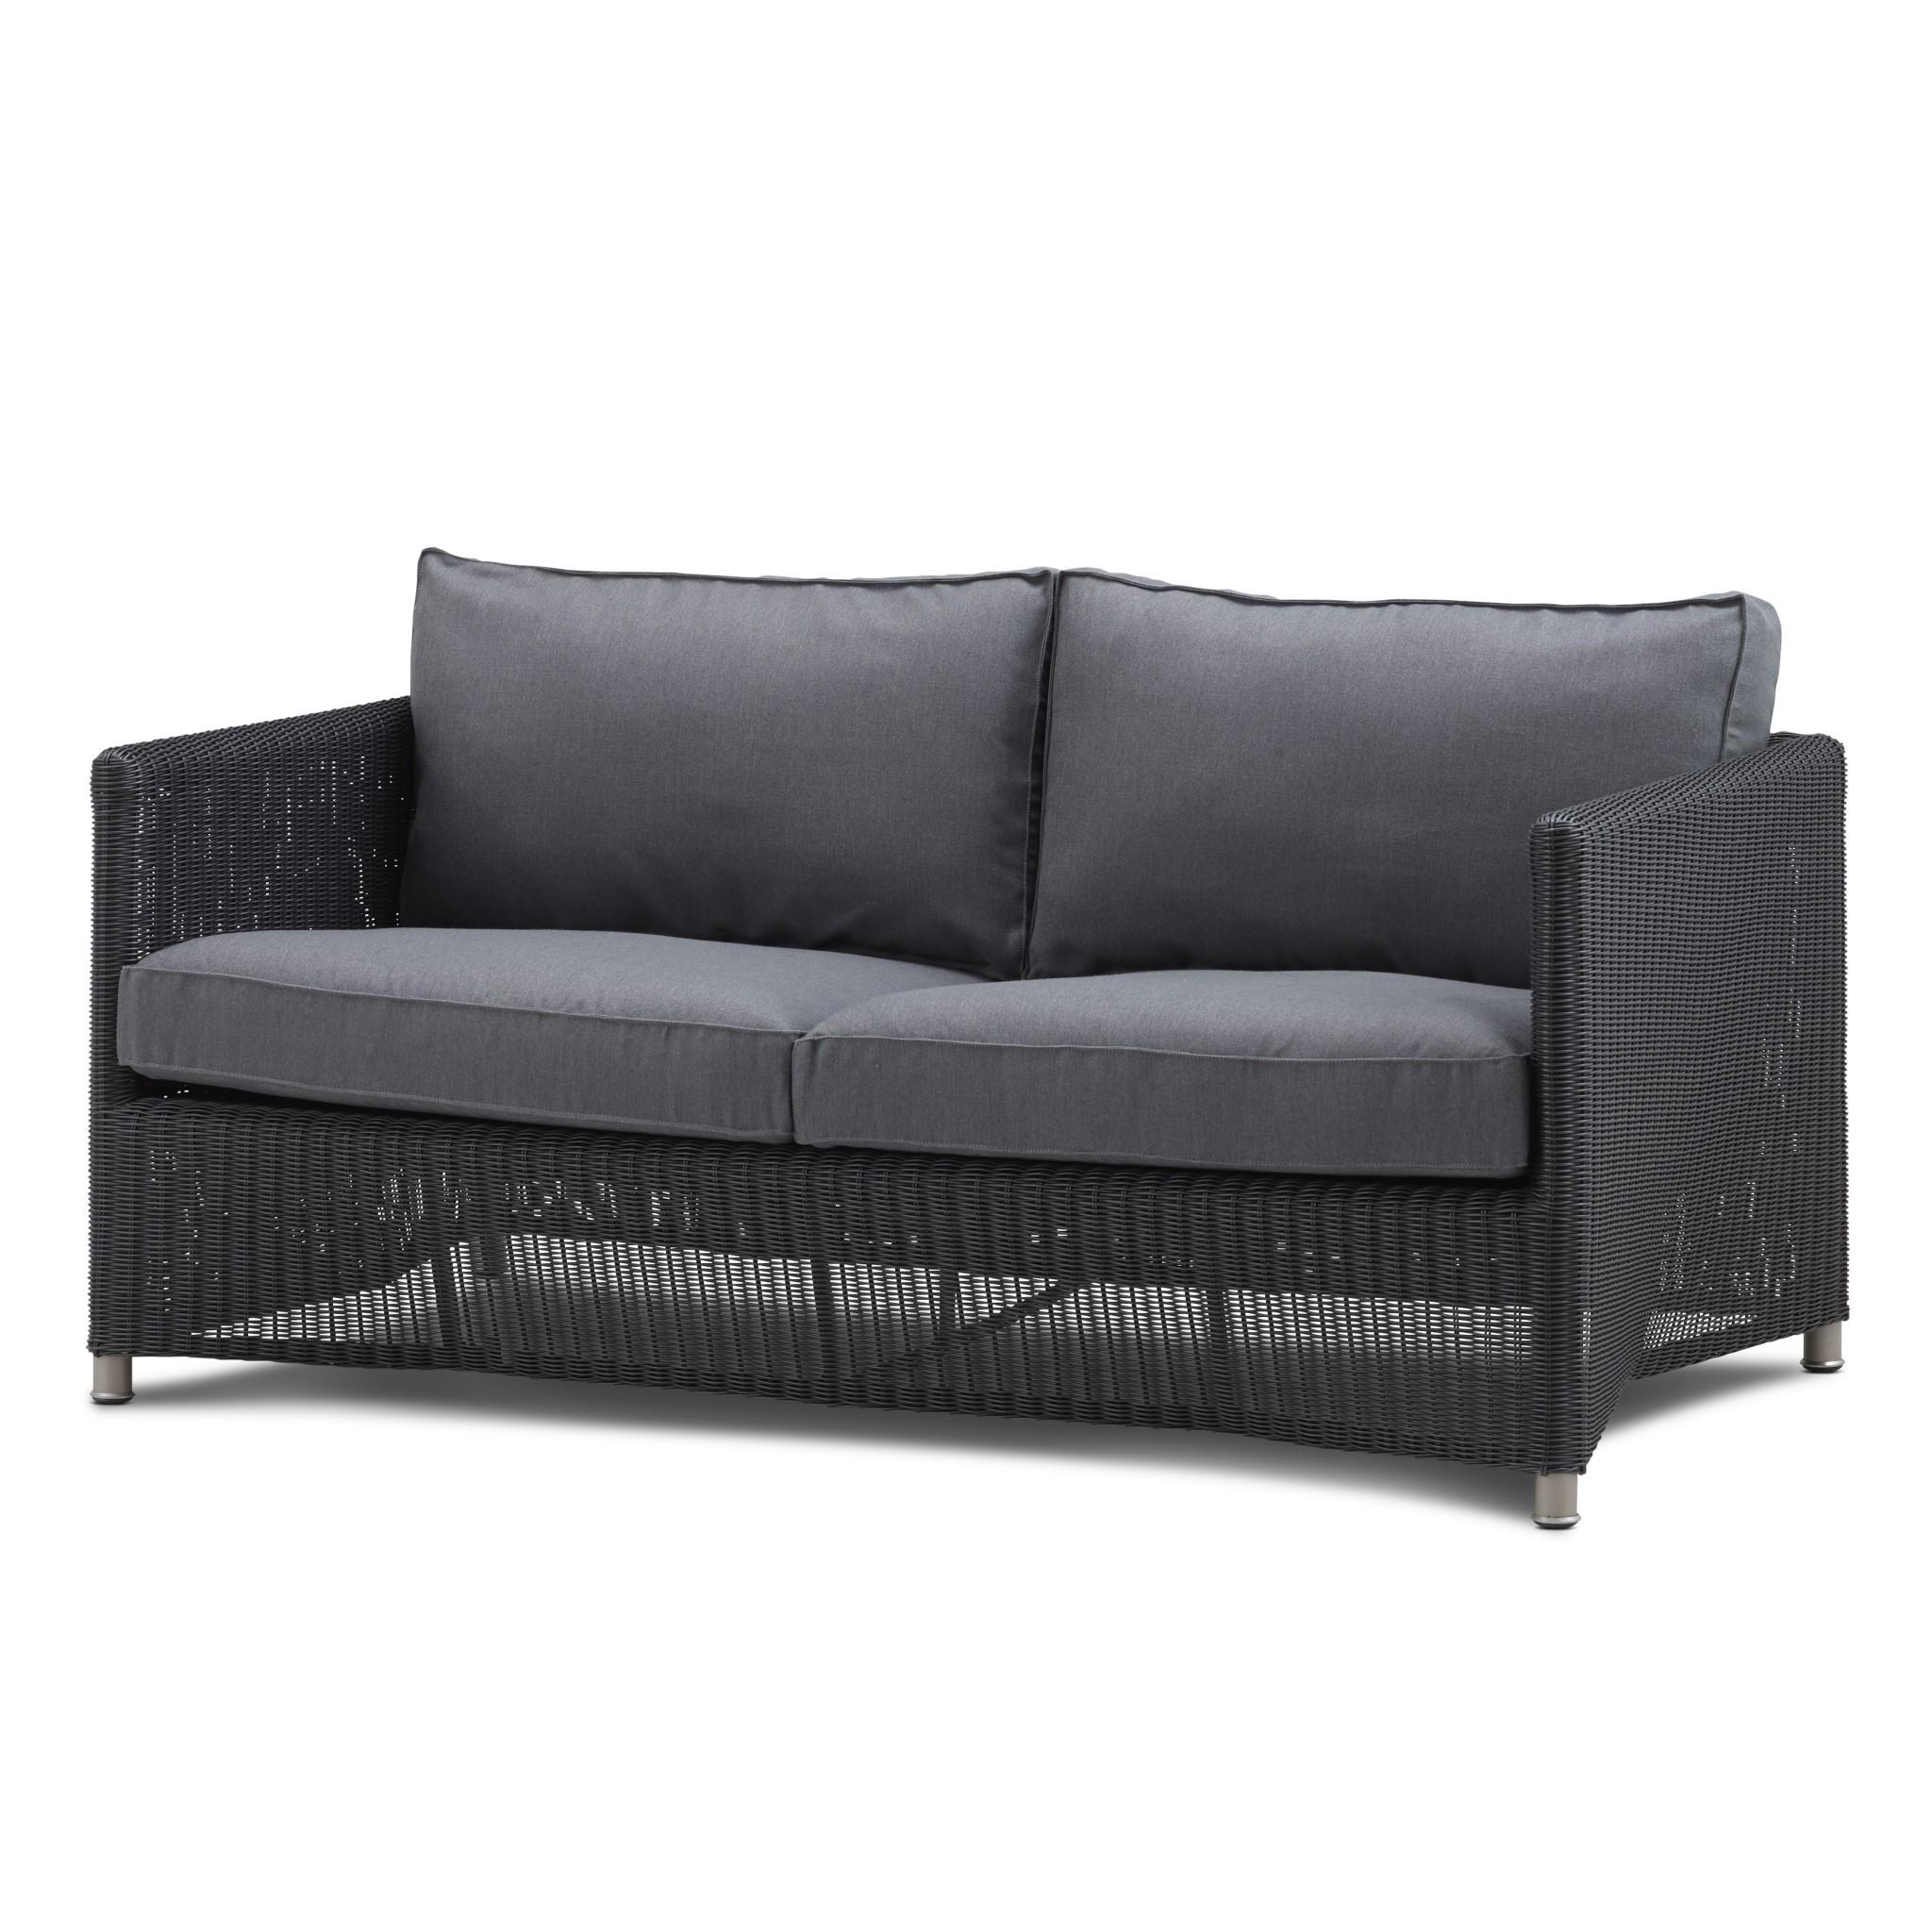 Diamond 2-Sitzer Sofa Geflecht